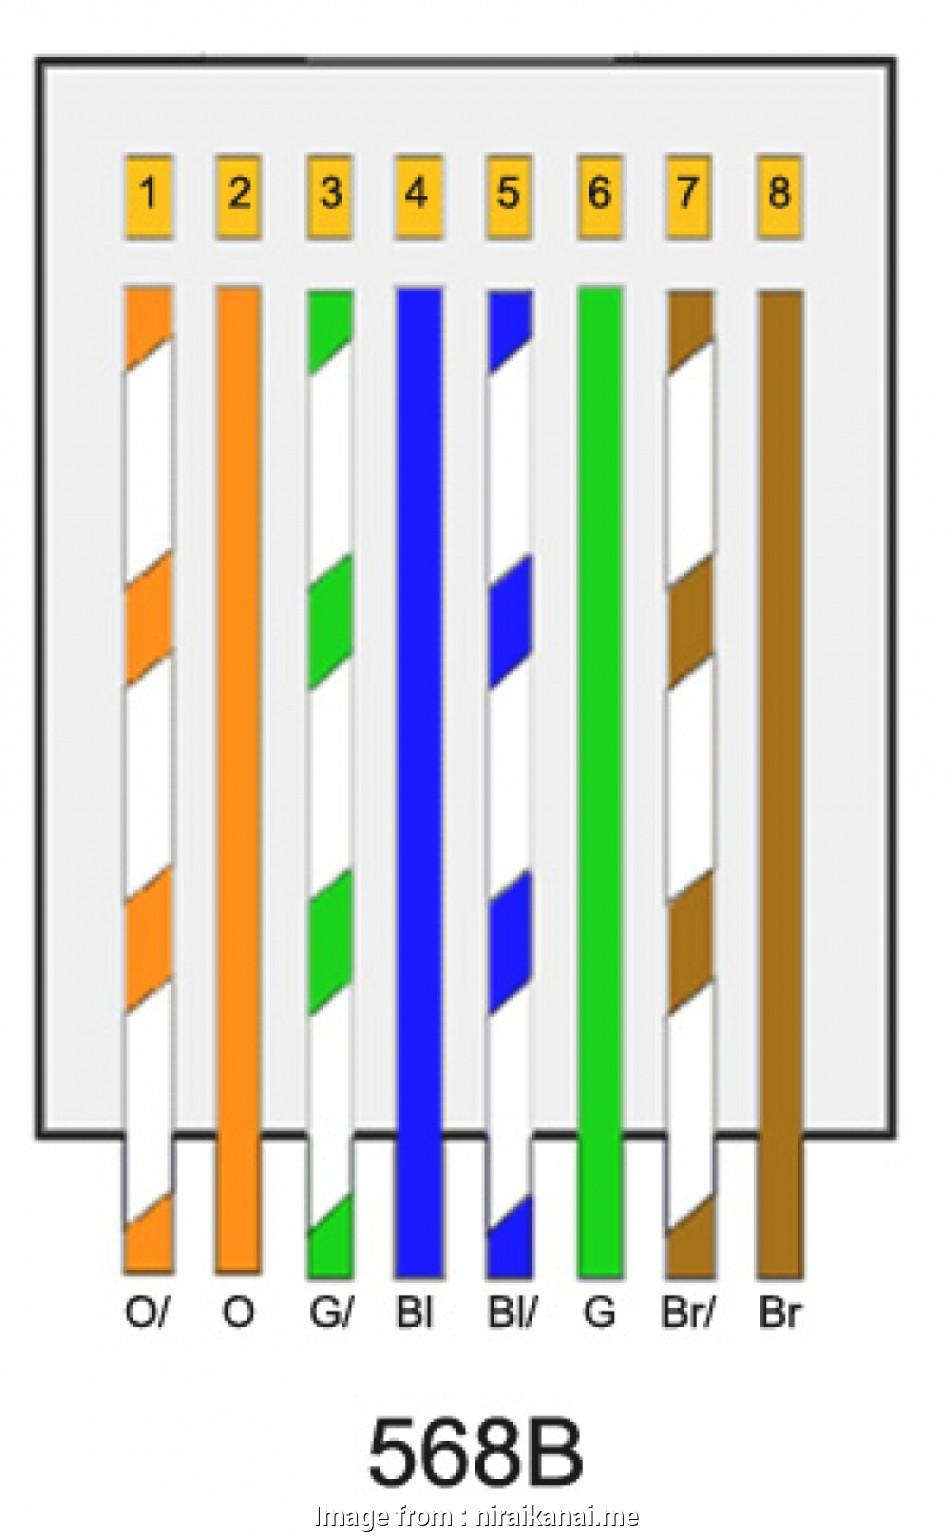 SC_6399] Cat6E Wiring Diagram Get Free Image About Wiring Diagram Wiring  DiagramDiog Barba Loida Waro Props Nerve Argu Ophag Pap Mohammedshrine Librar  Wiring 101